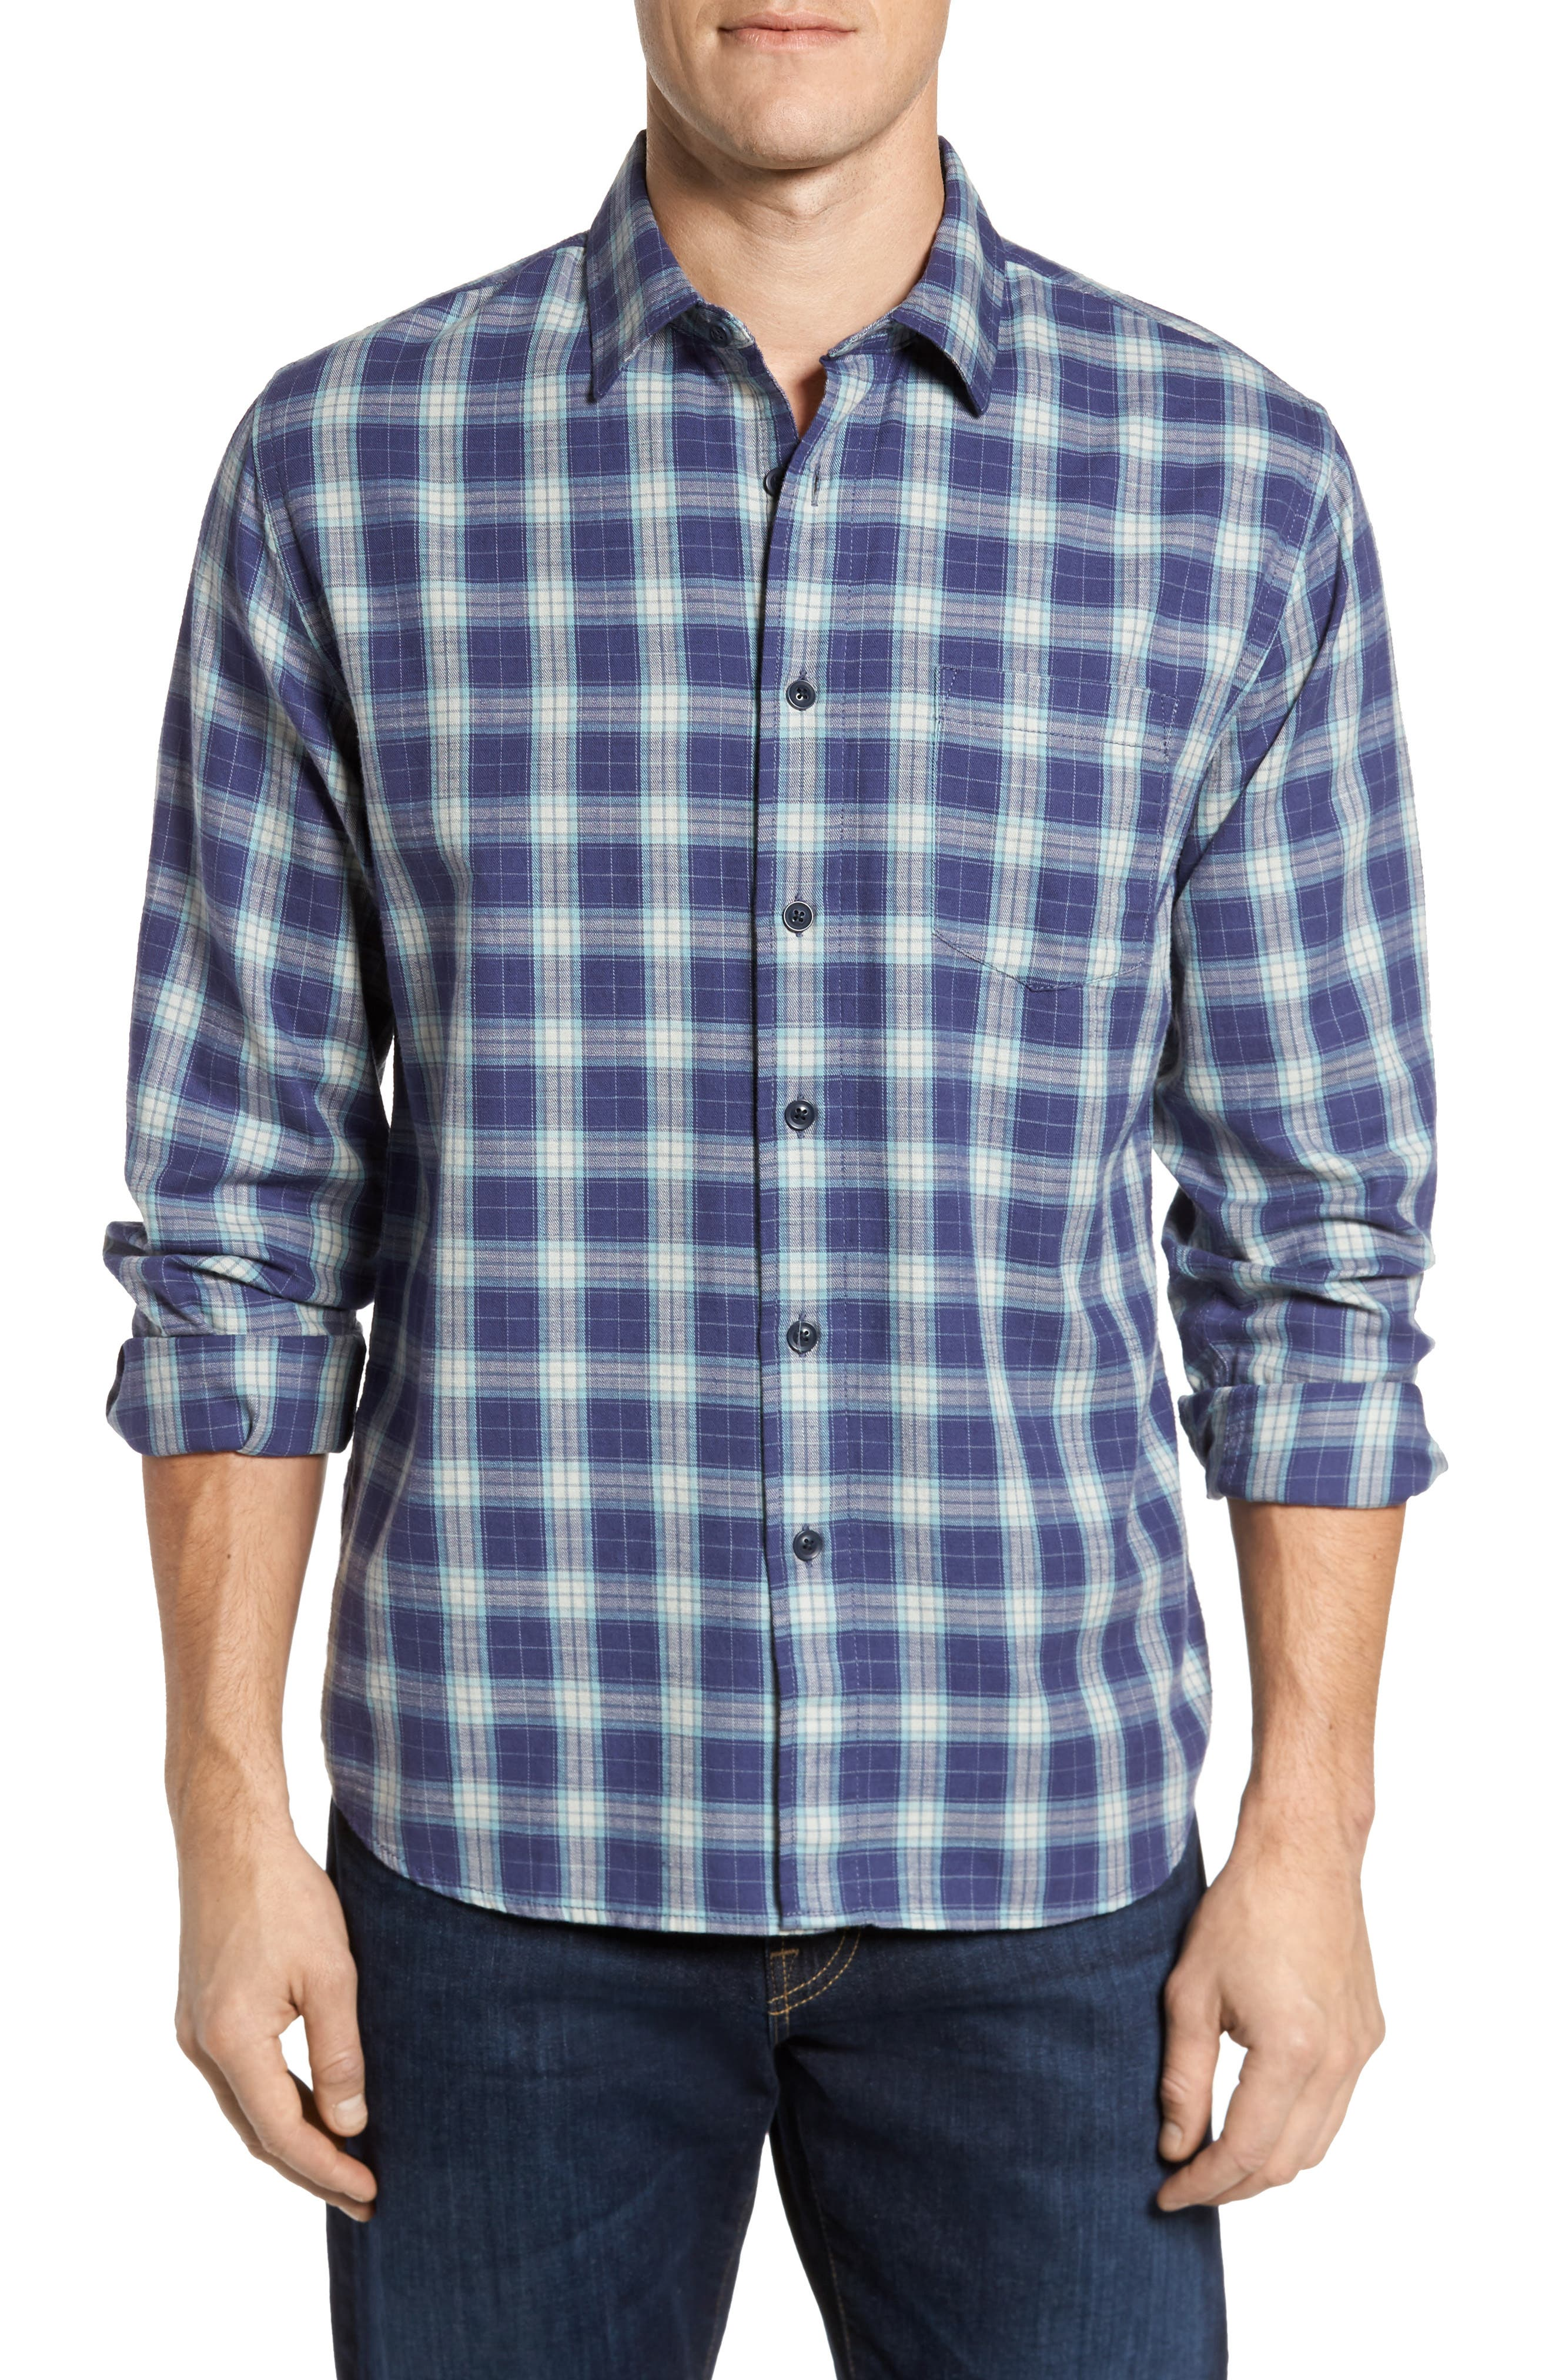 Main Image - Grayers Walden Slim Fit Plaid Slub Twill Sport Shirt